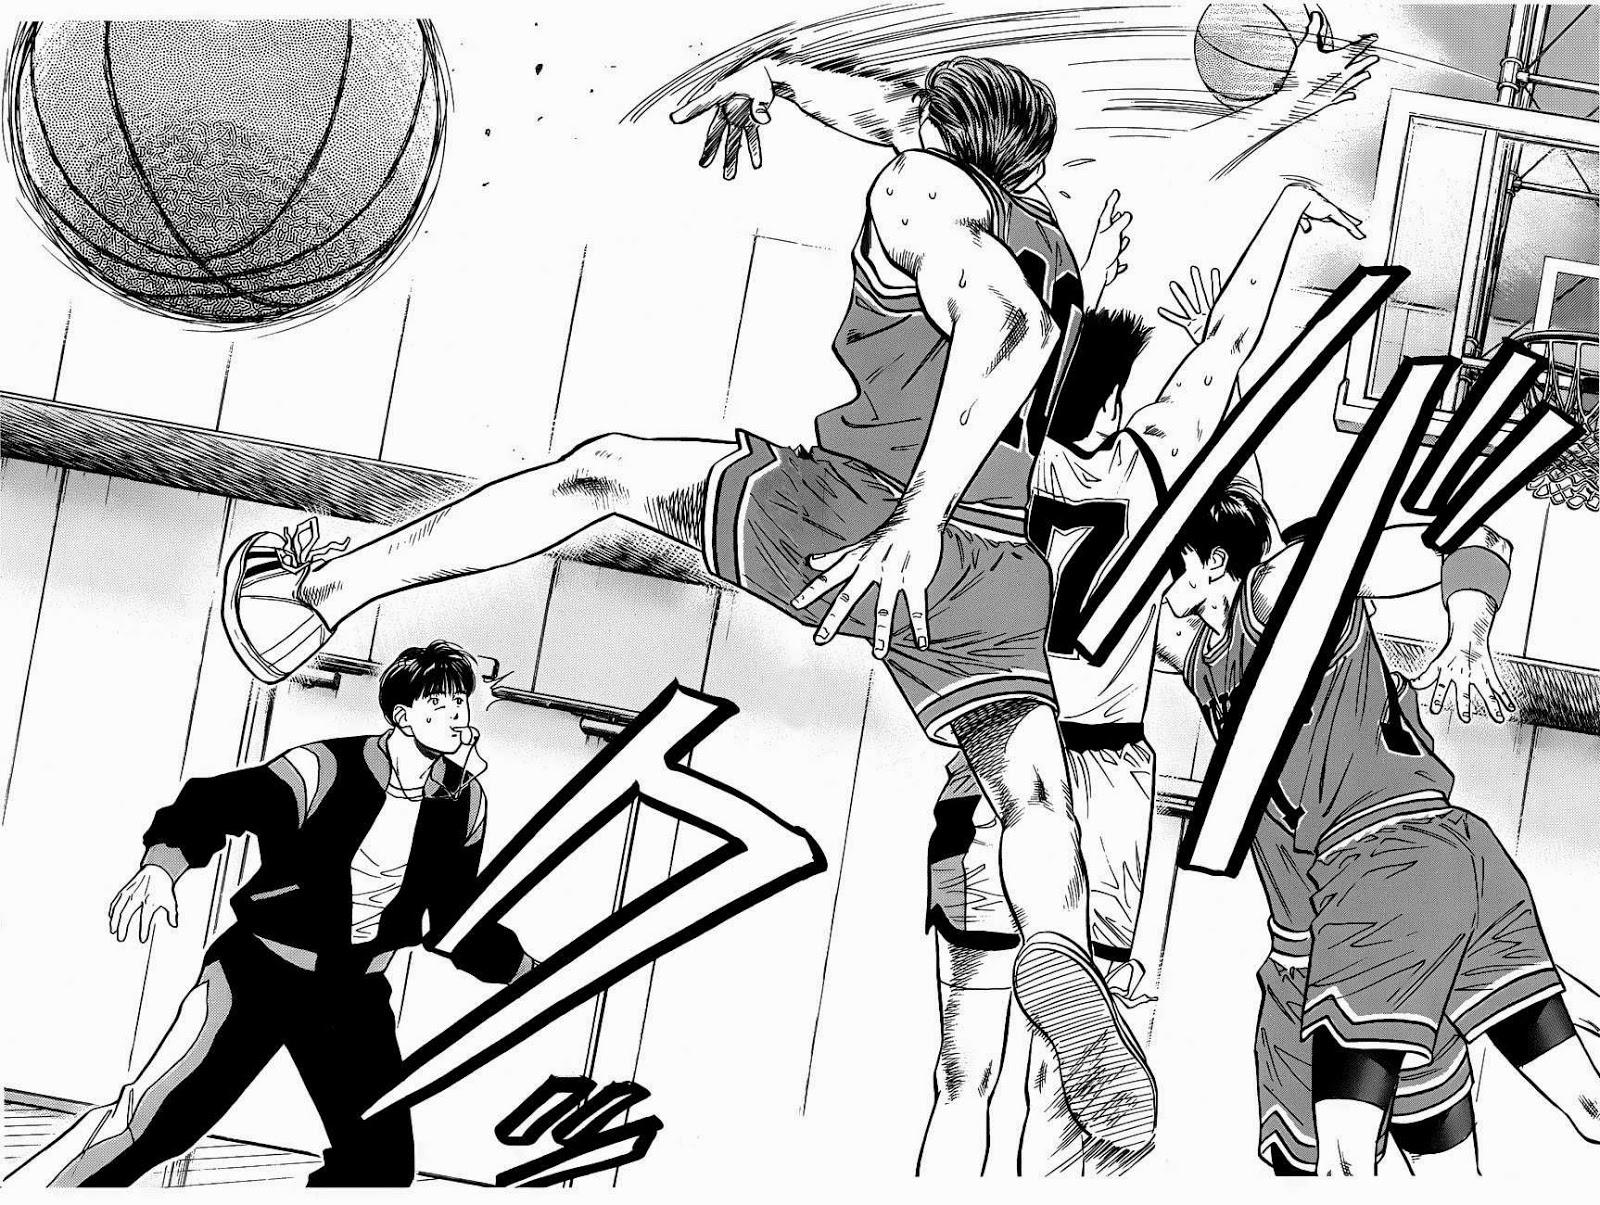 Komik slam dunk 045 - chapter 45 46 Indonesia slam dunk 045 - chapter 45 Terbaru 7|Baca Manga Komik Indonesia|